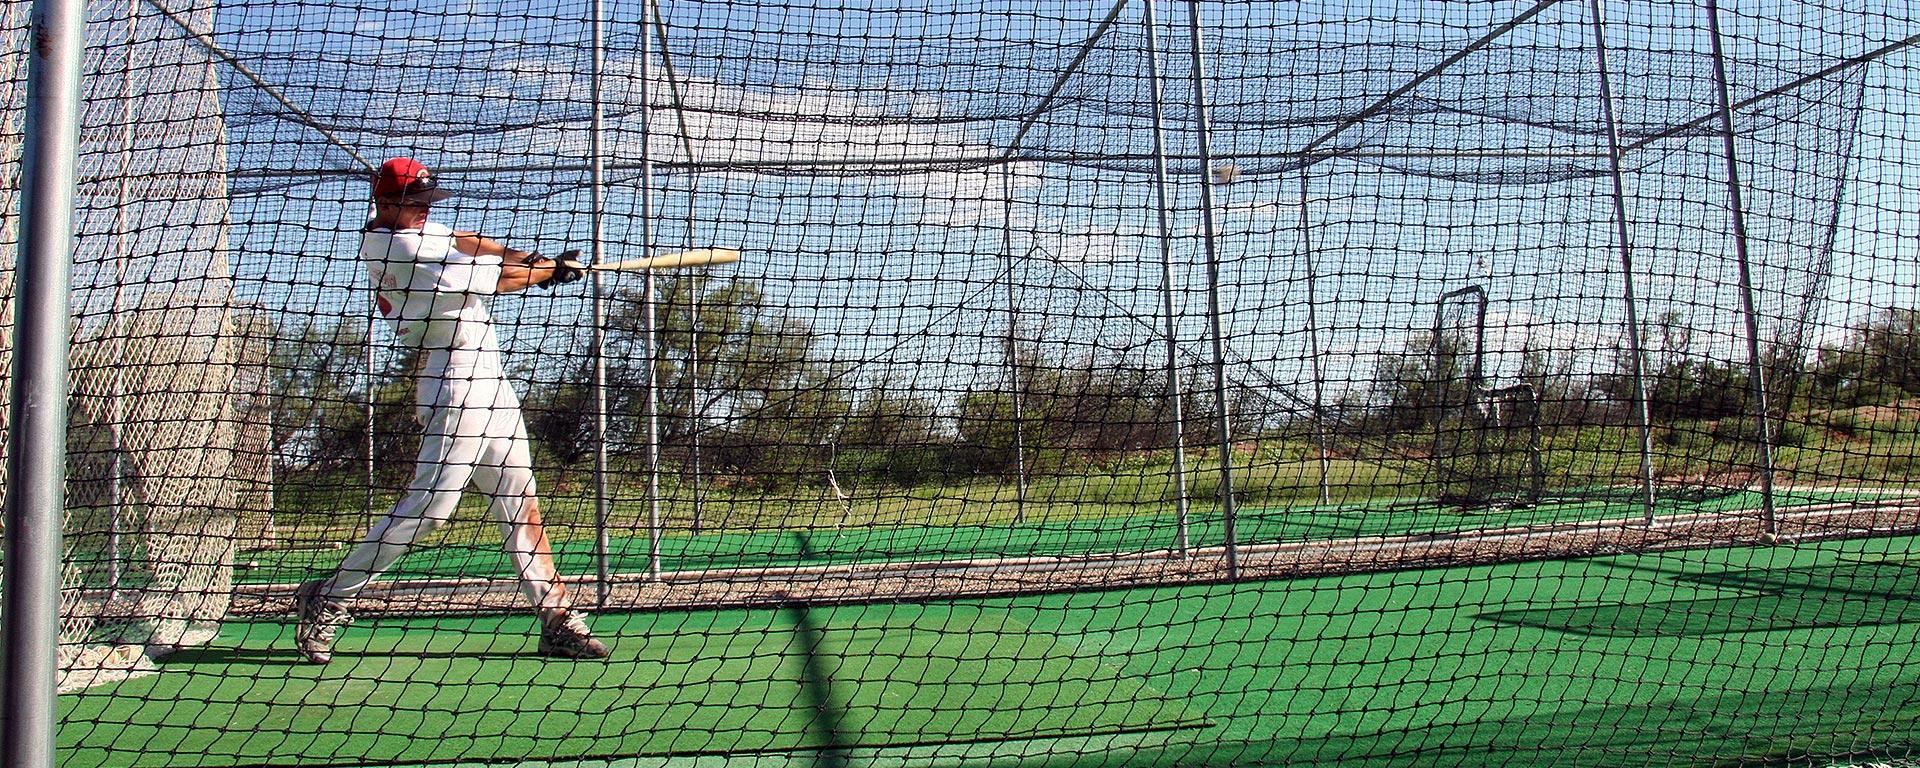 outdoor carpet for batting cage carpet vidalondon